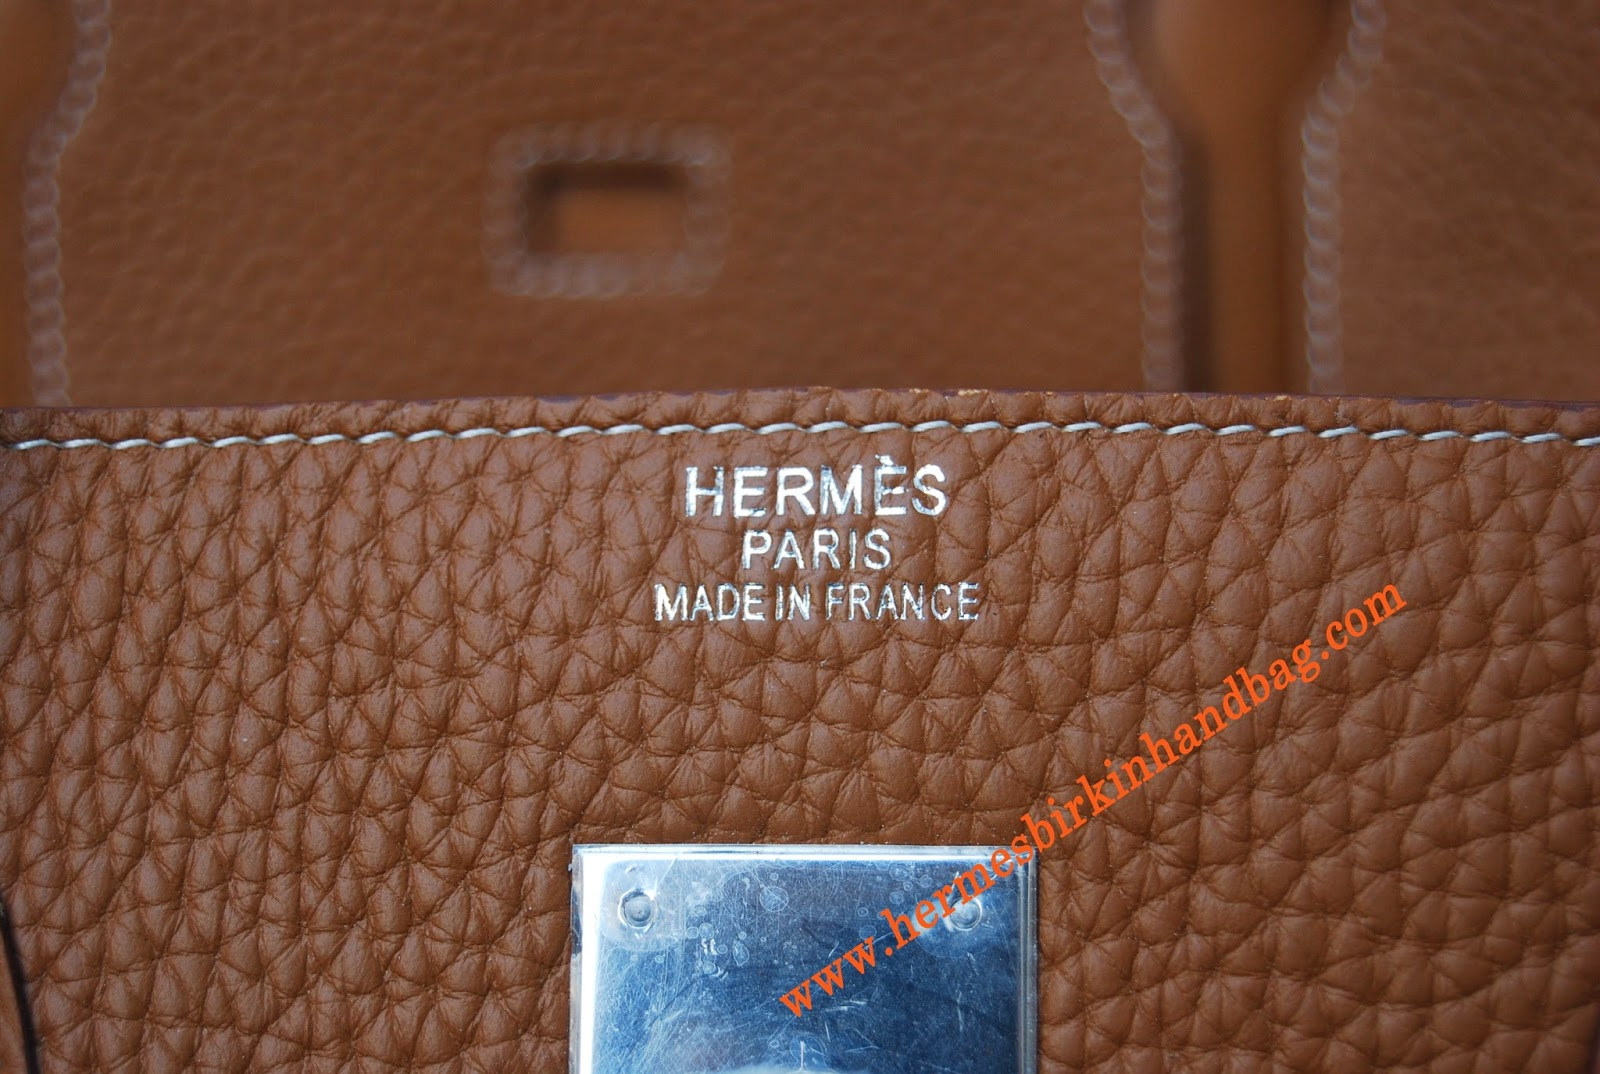 6928547a10 hermes belts  Hermes birkin 35 gold togo leather or clemence leather ...